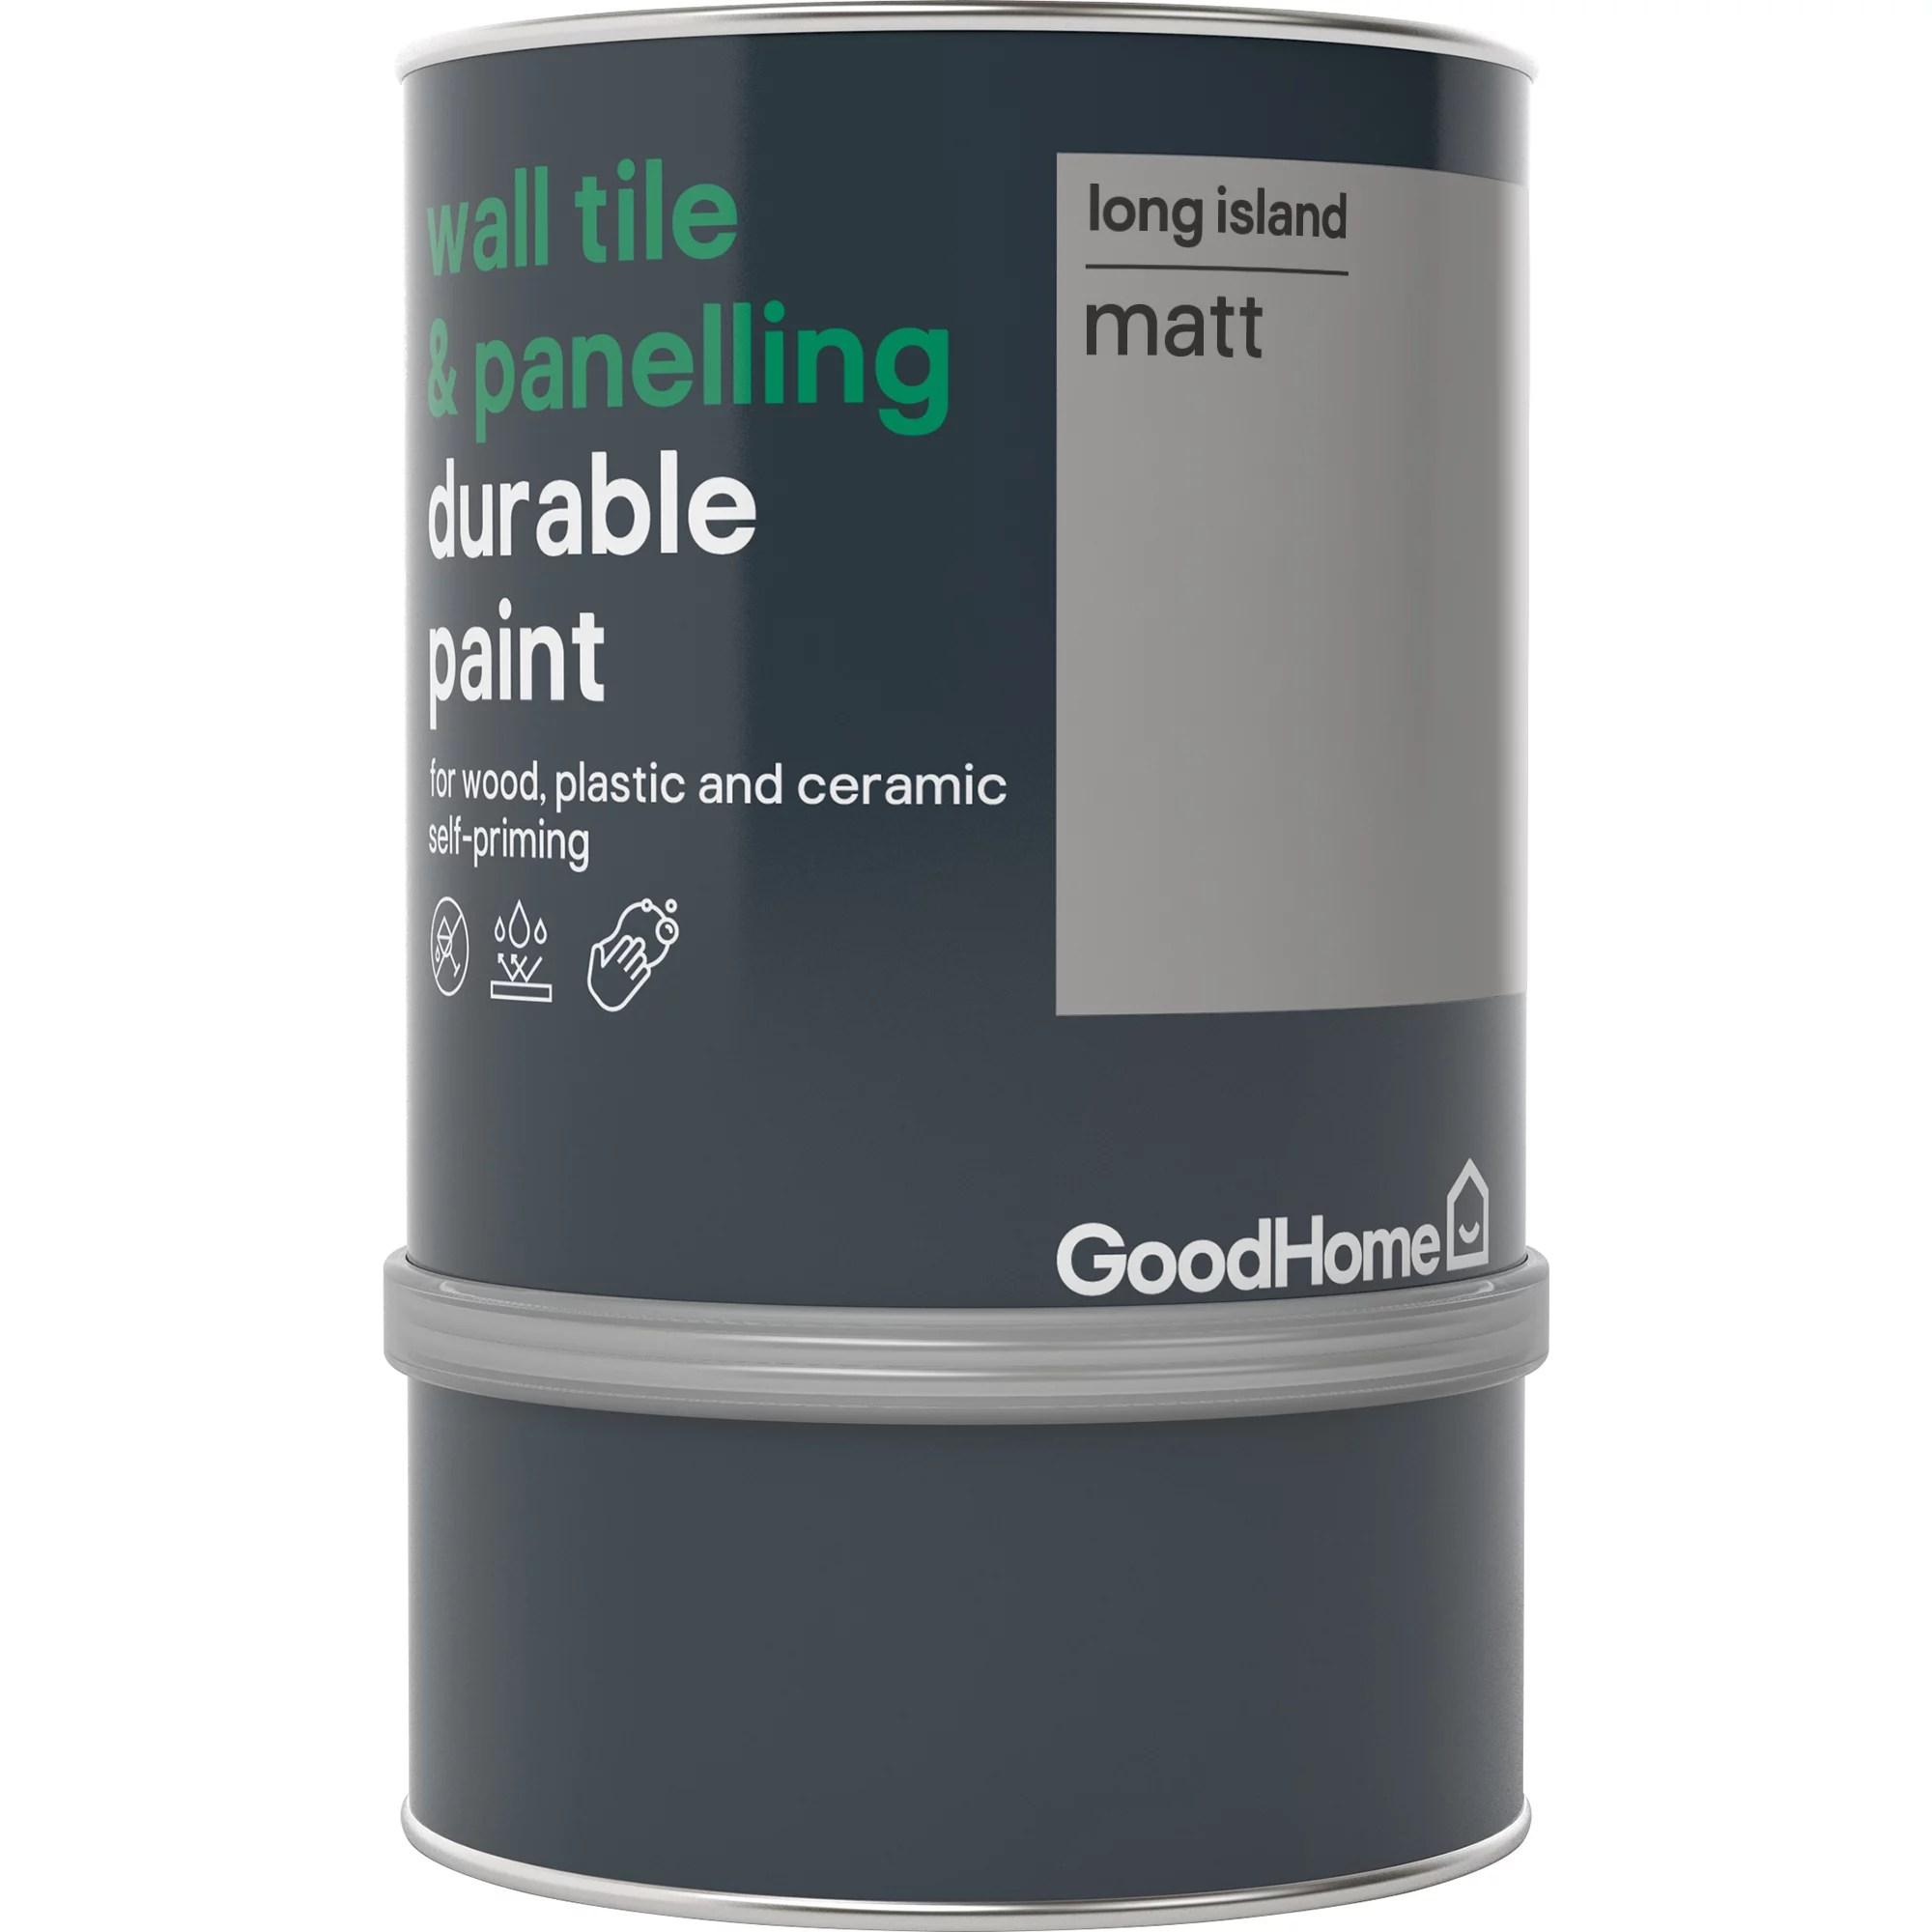 goodhome durable long island matt wall tile panelling paint 750ml